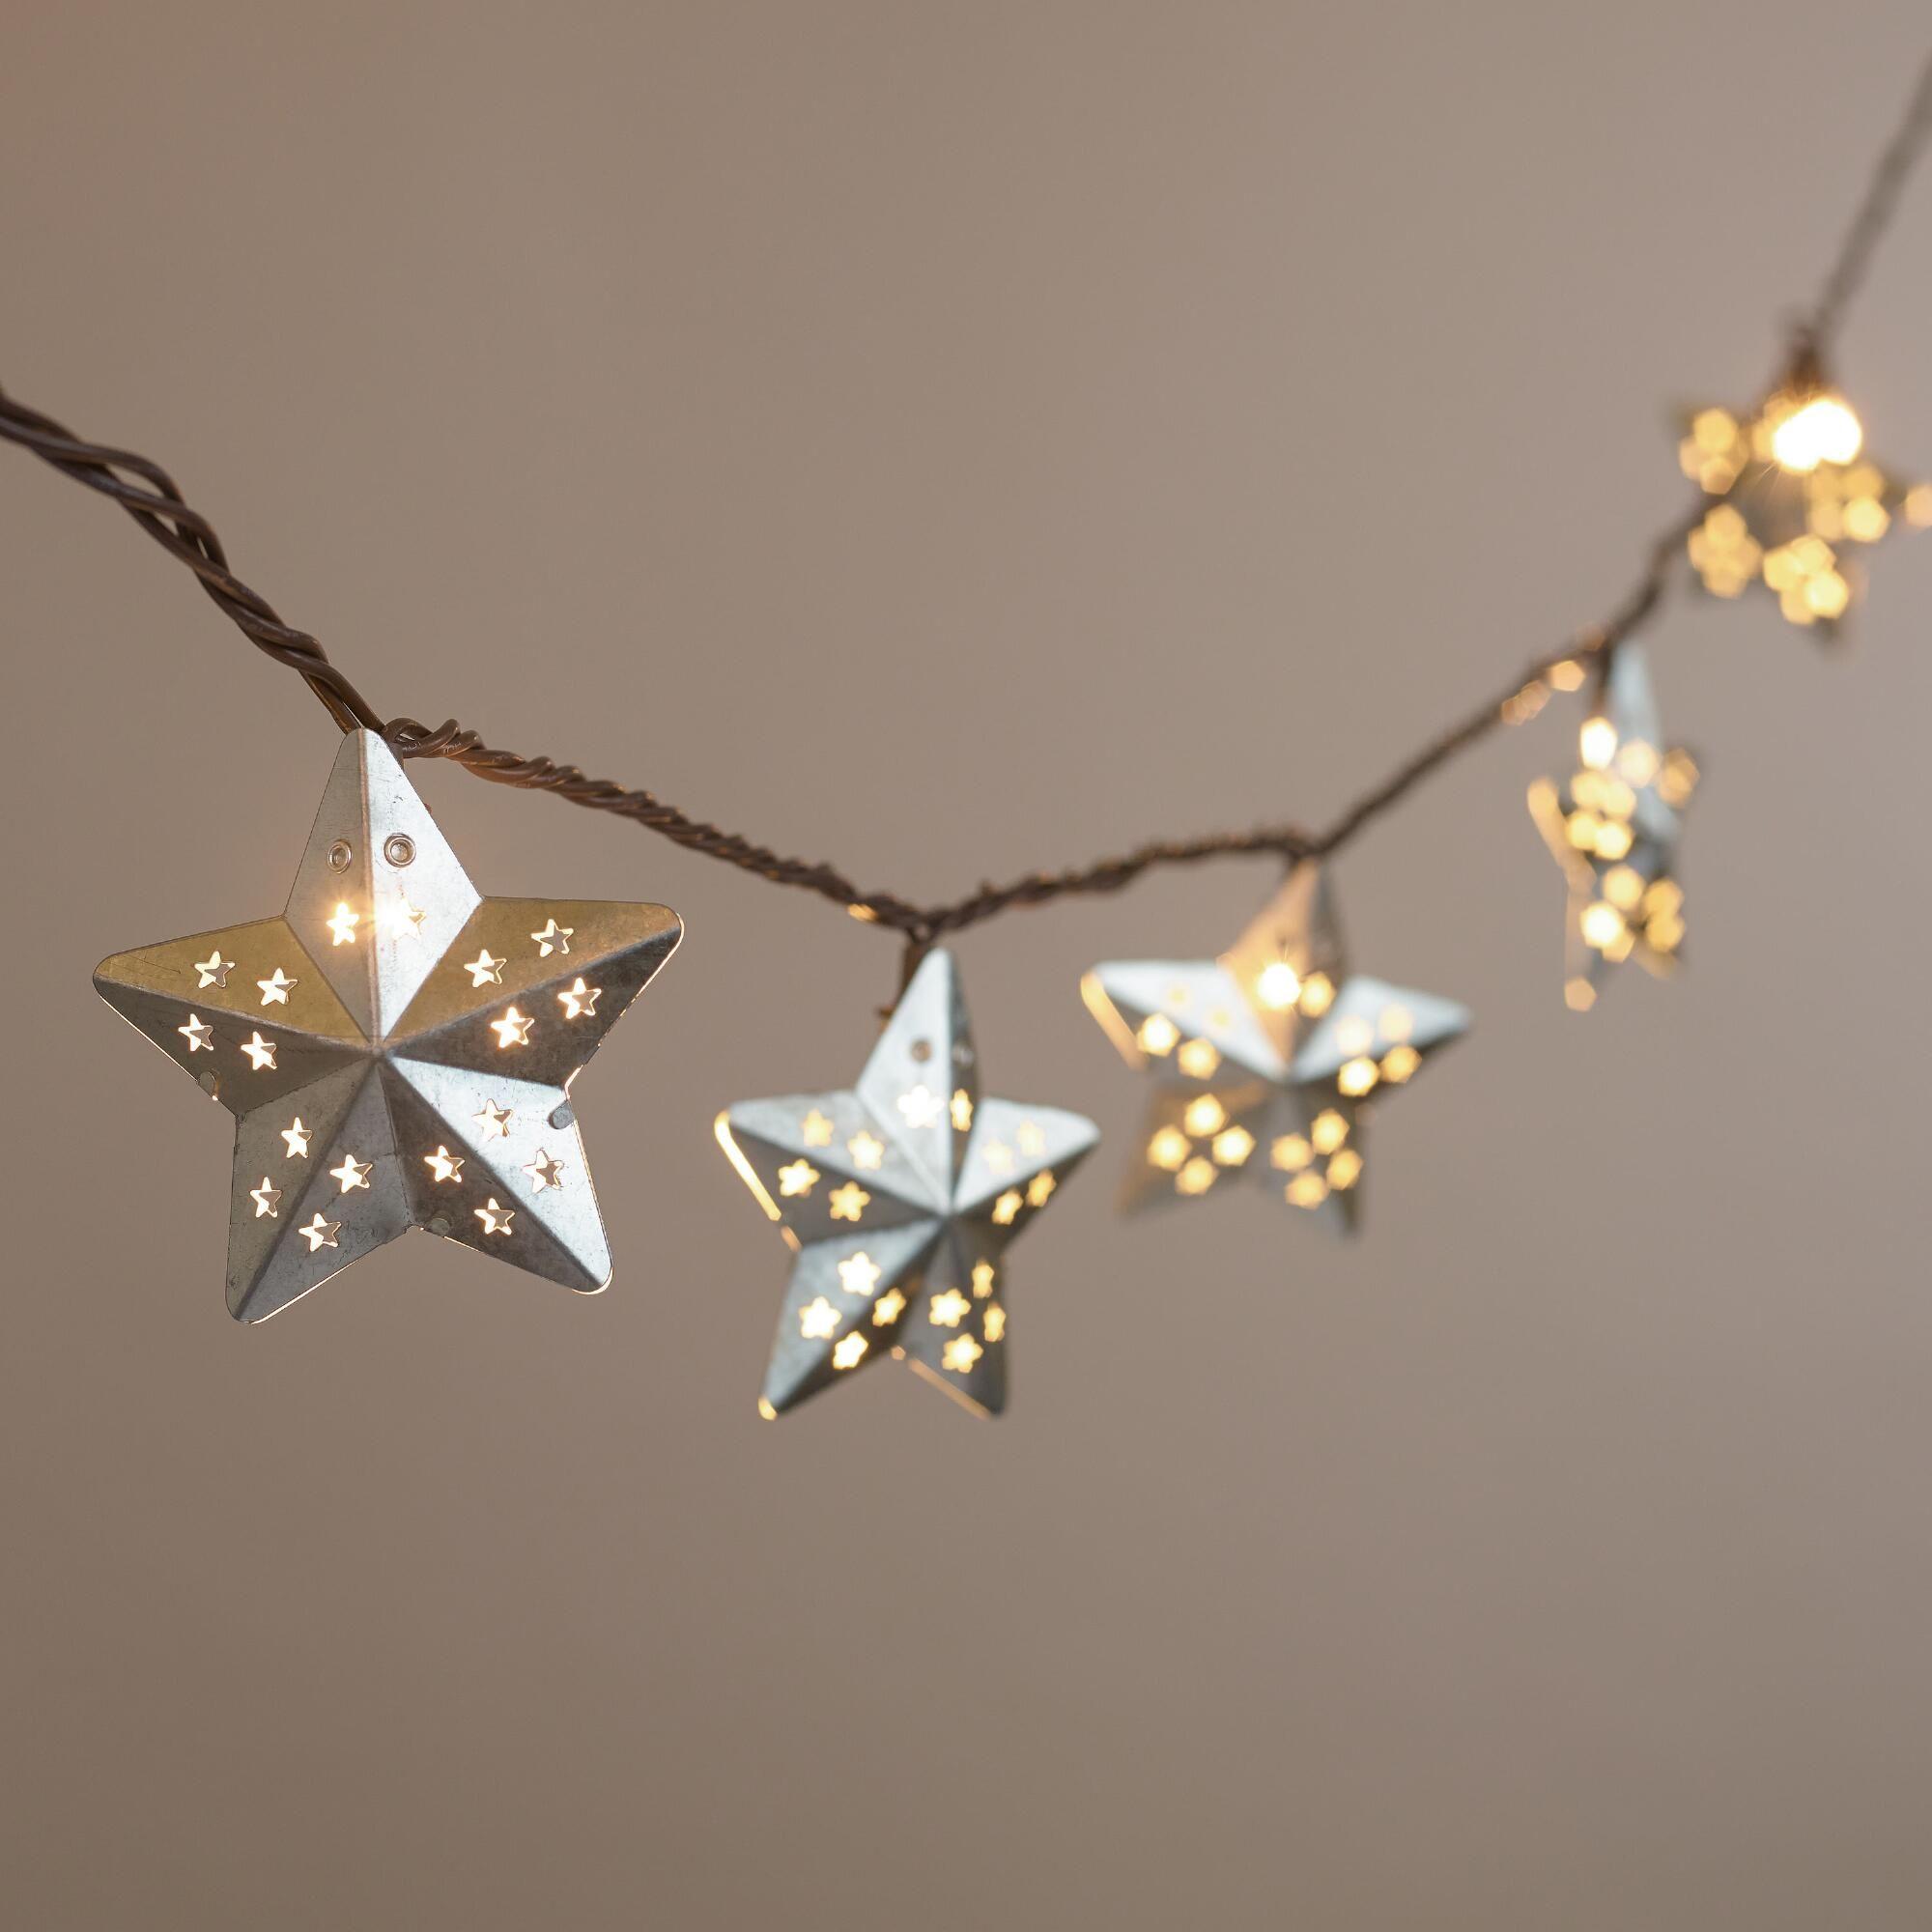 Uncategorized String Lights Stars galvanized metal stars 10 bulb string lights star lights